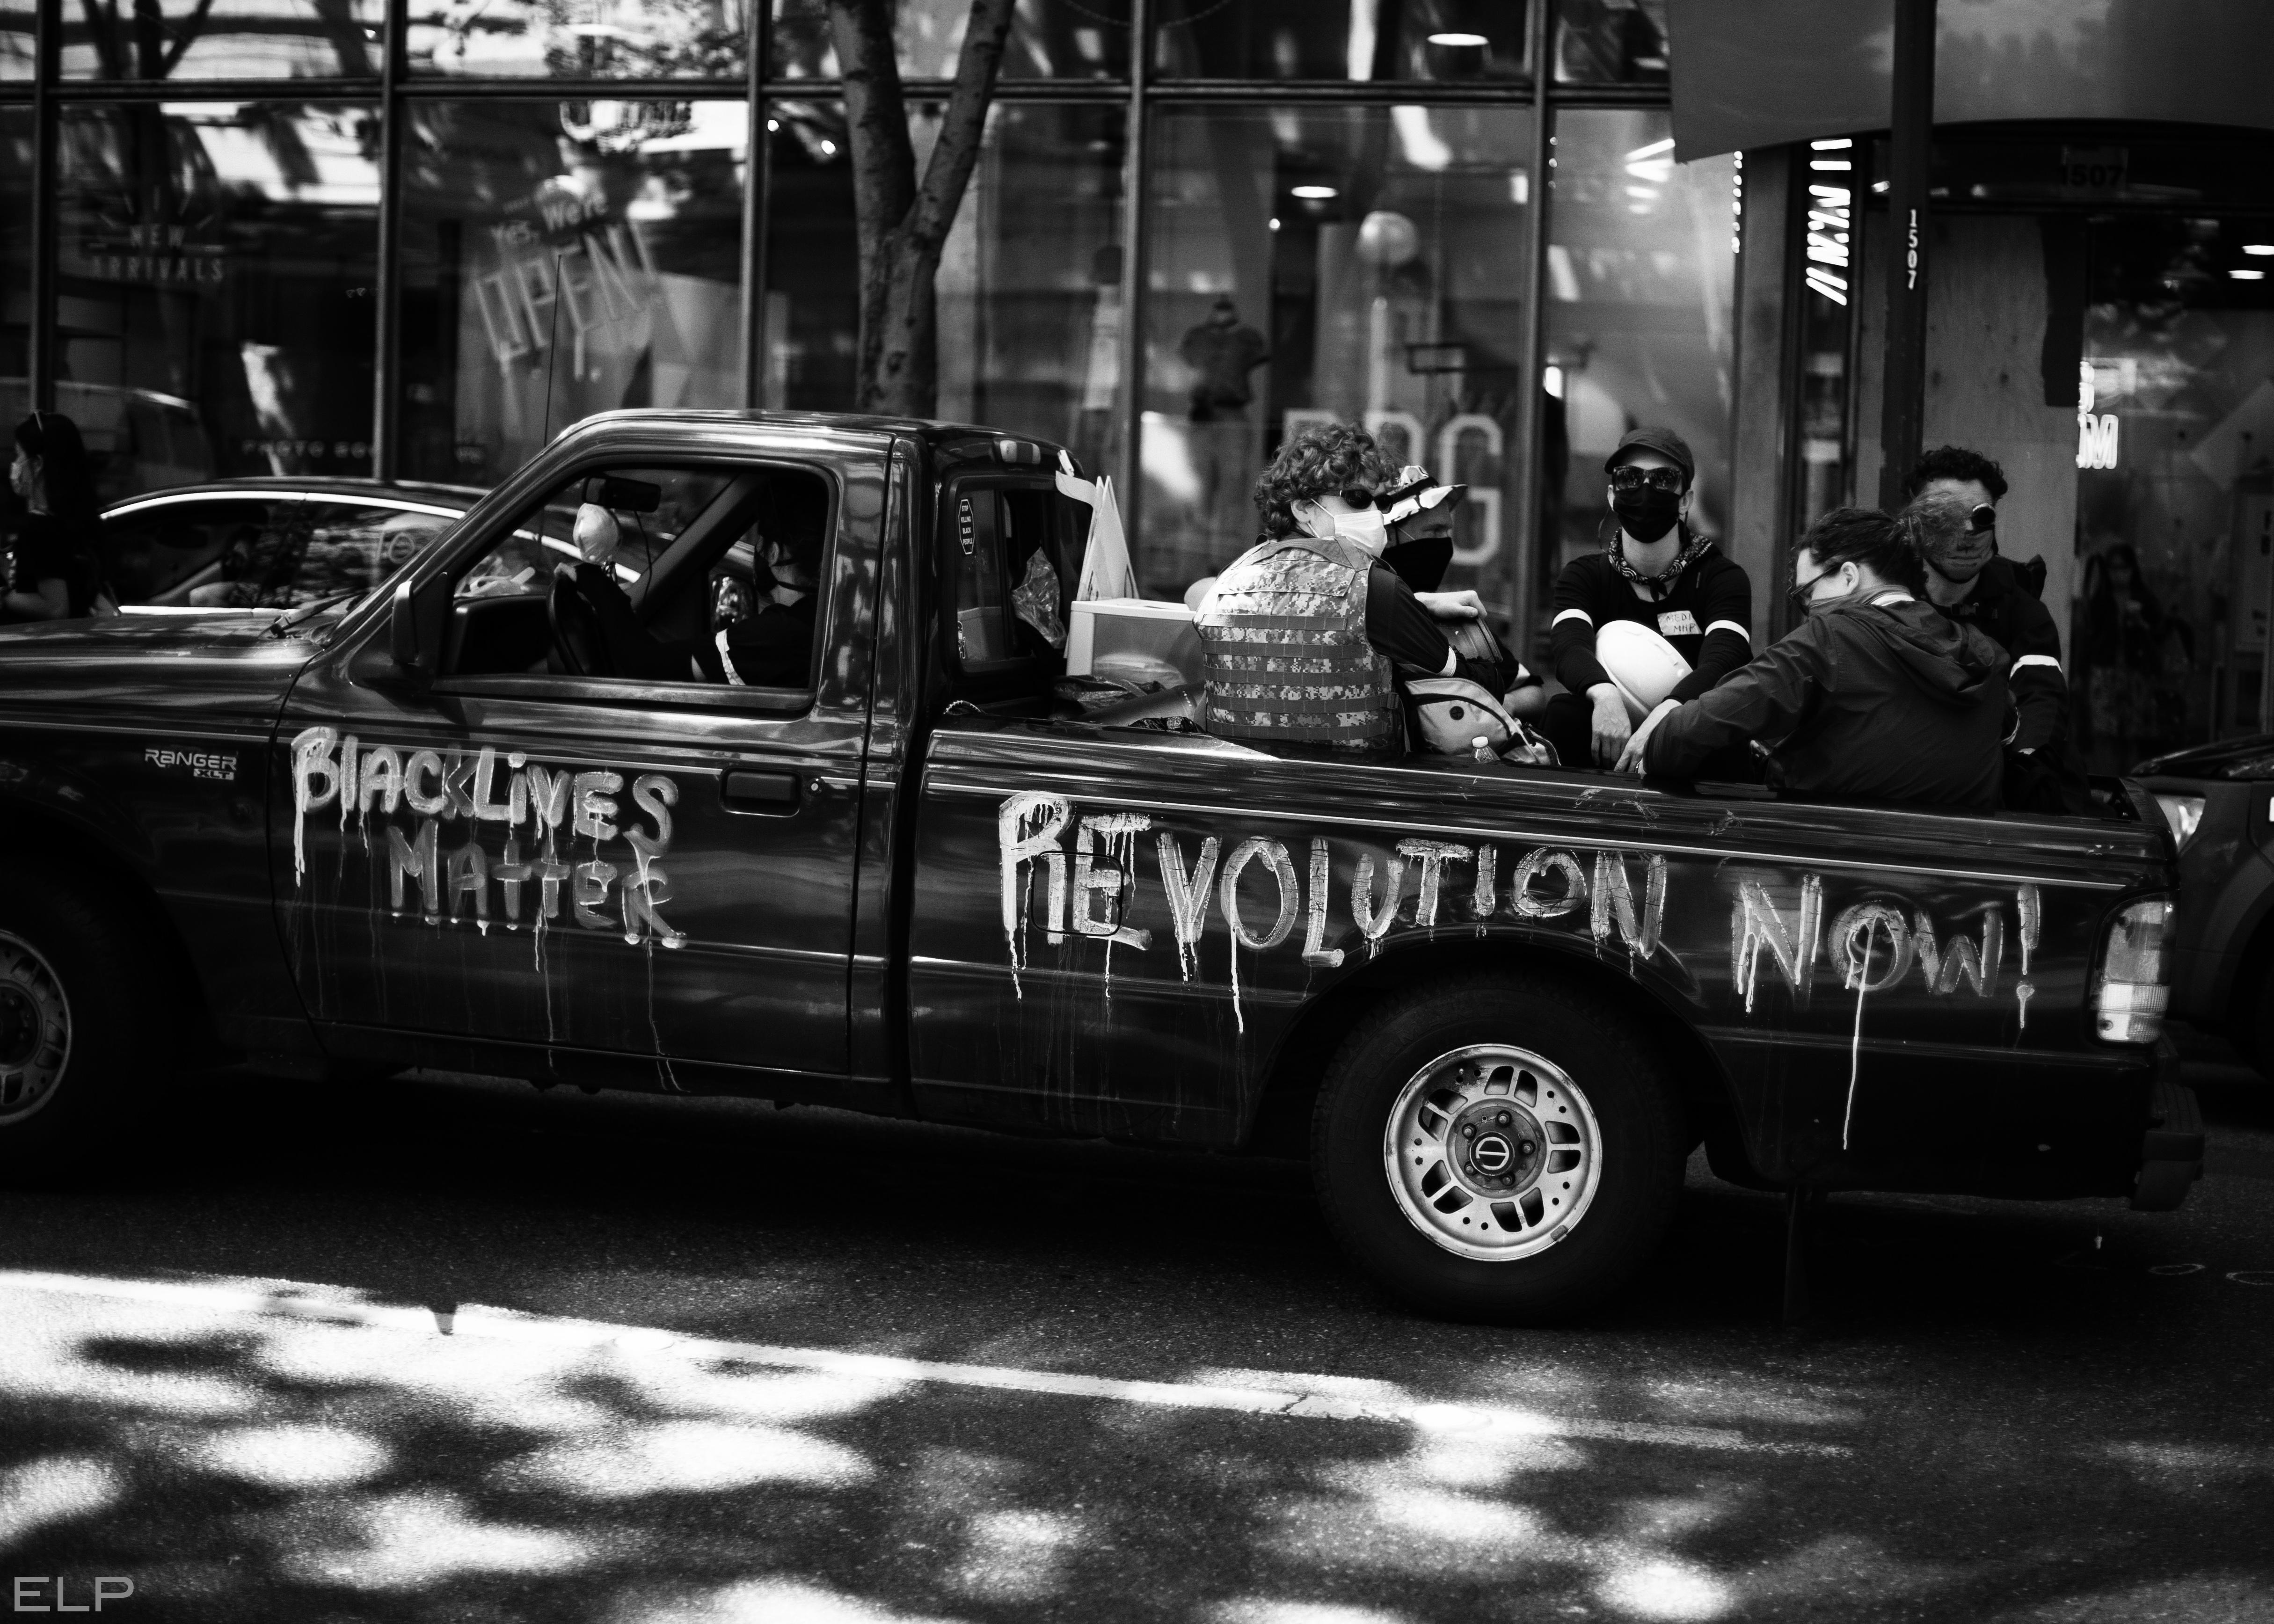 anti-ICE march Revolution Now truck of volunteer medics